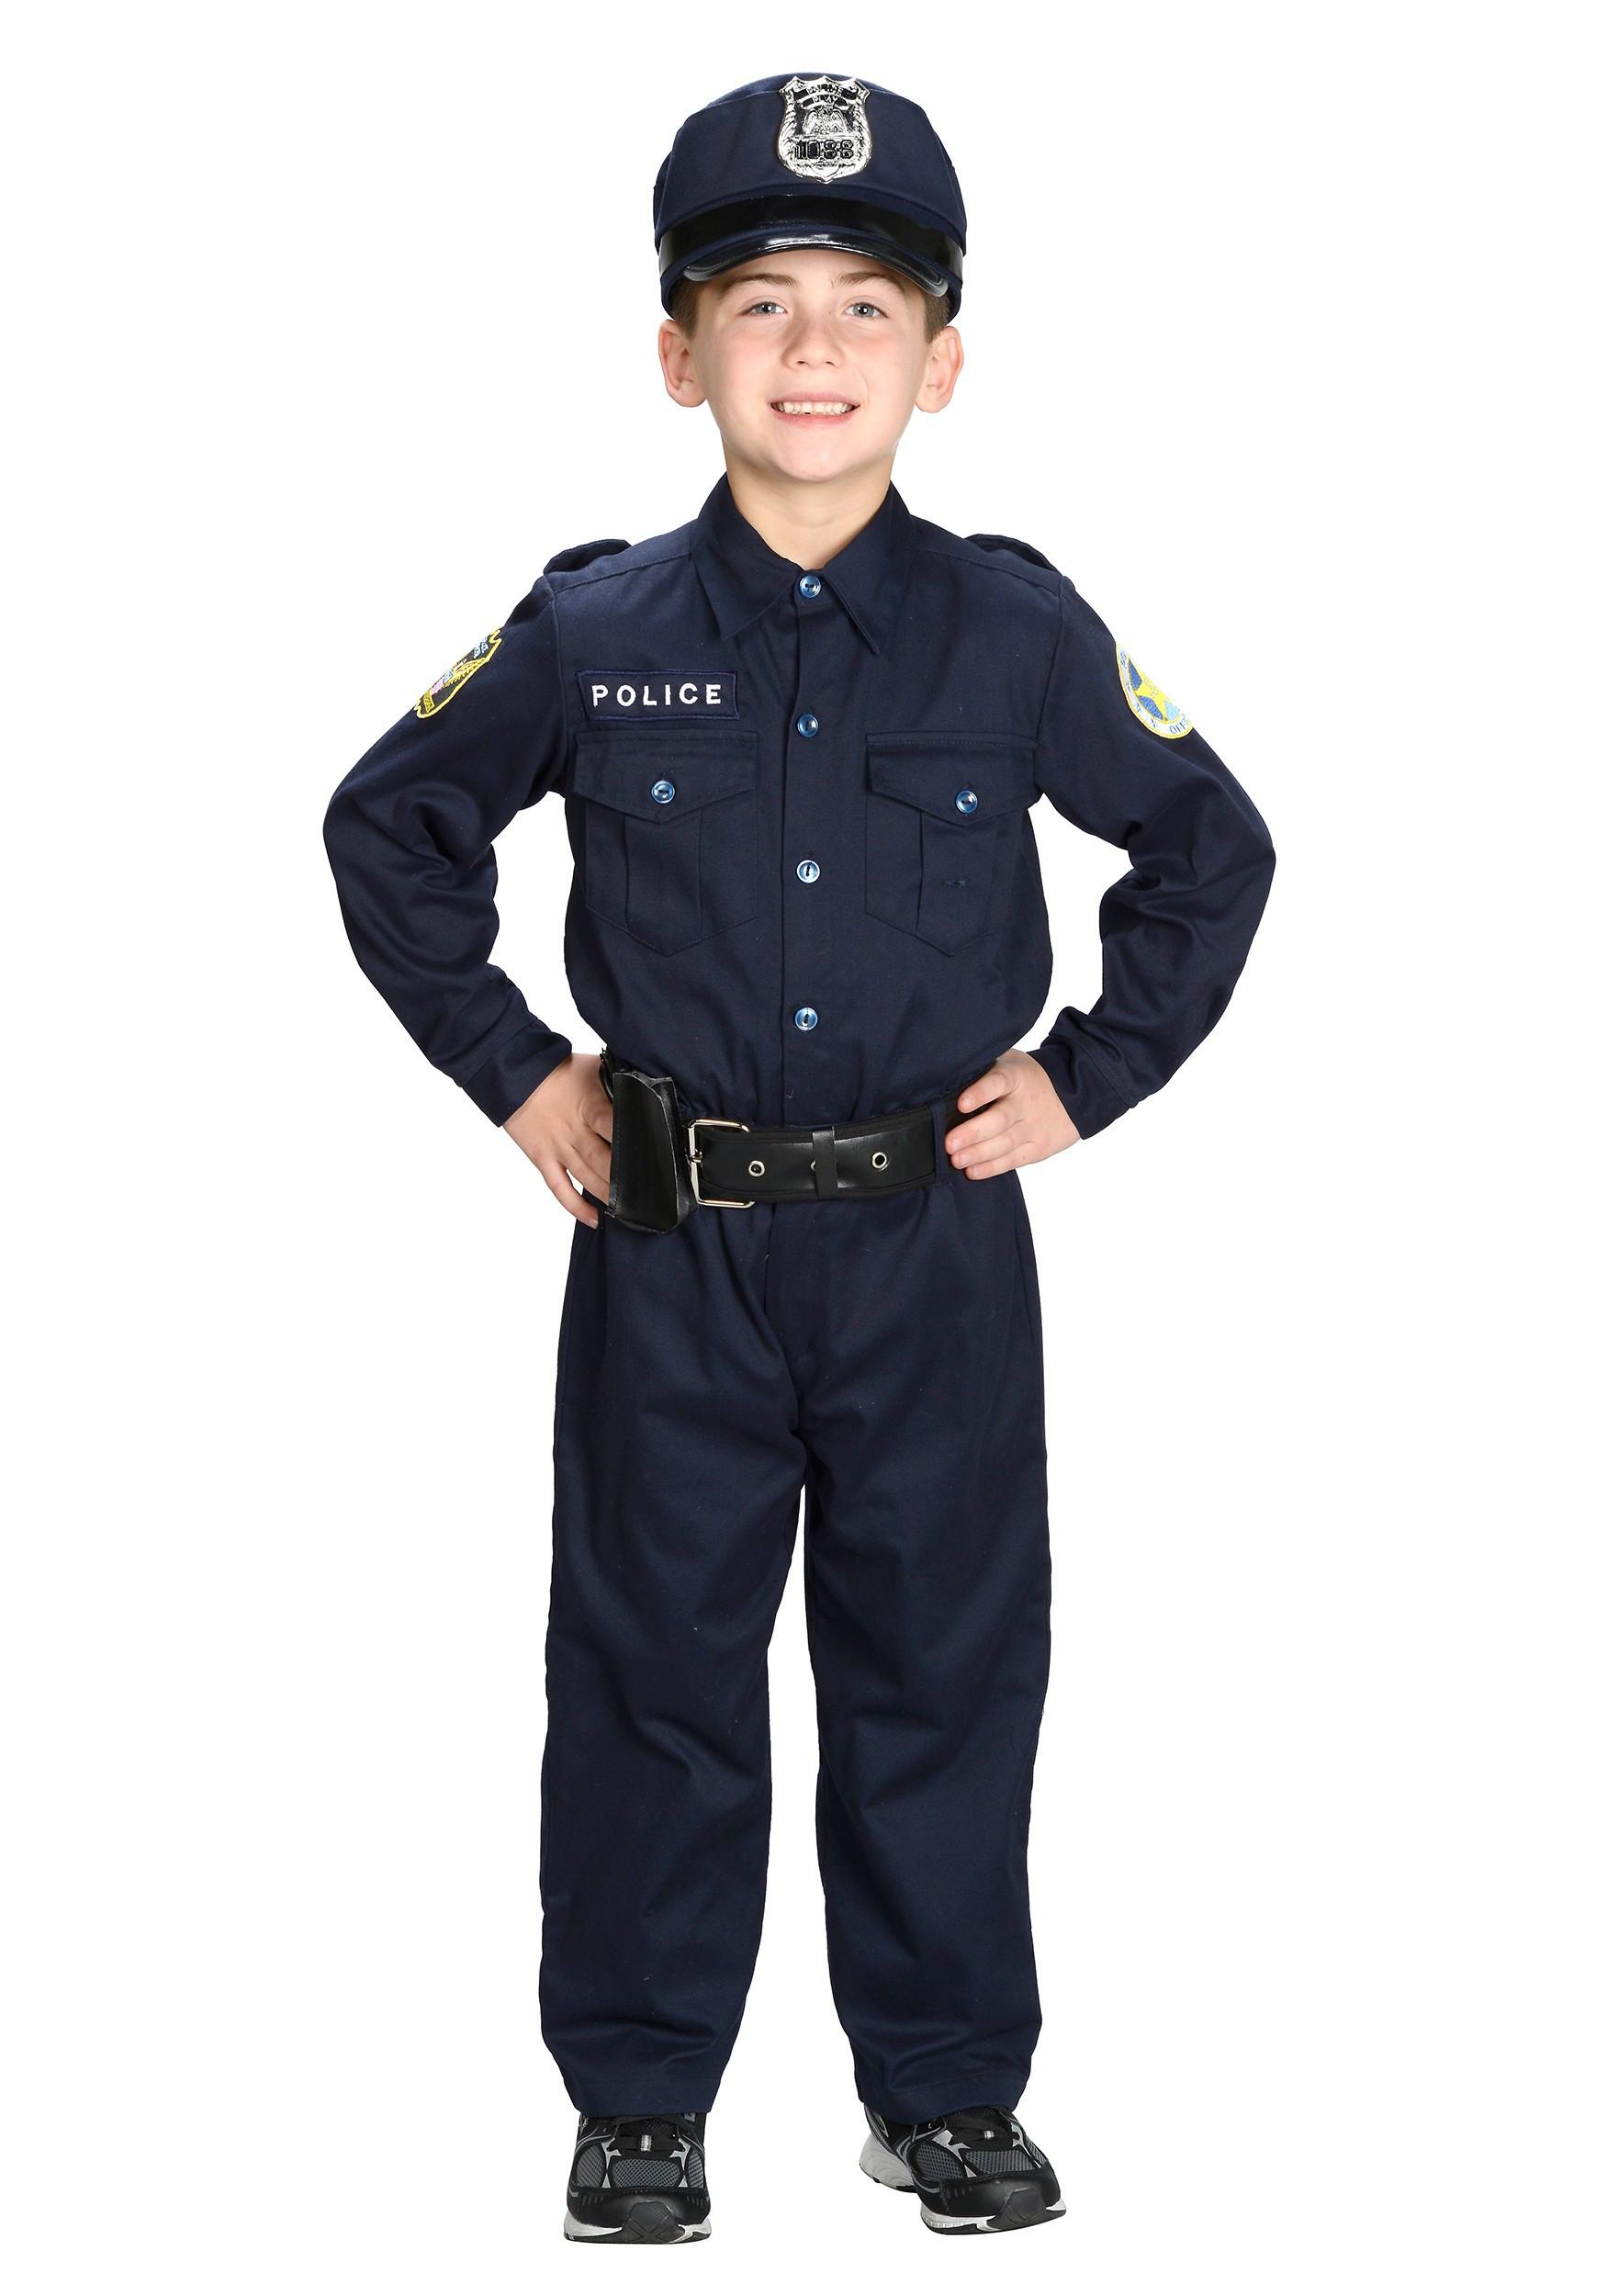 Police Costume Kid Transparent